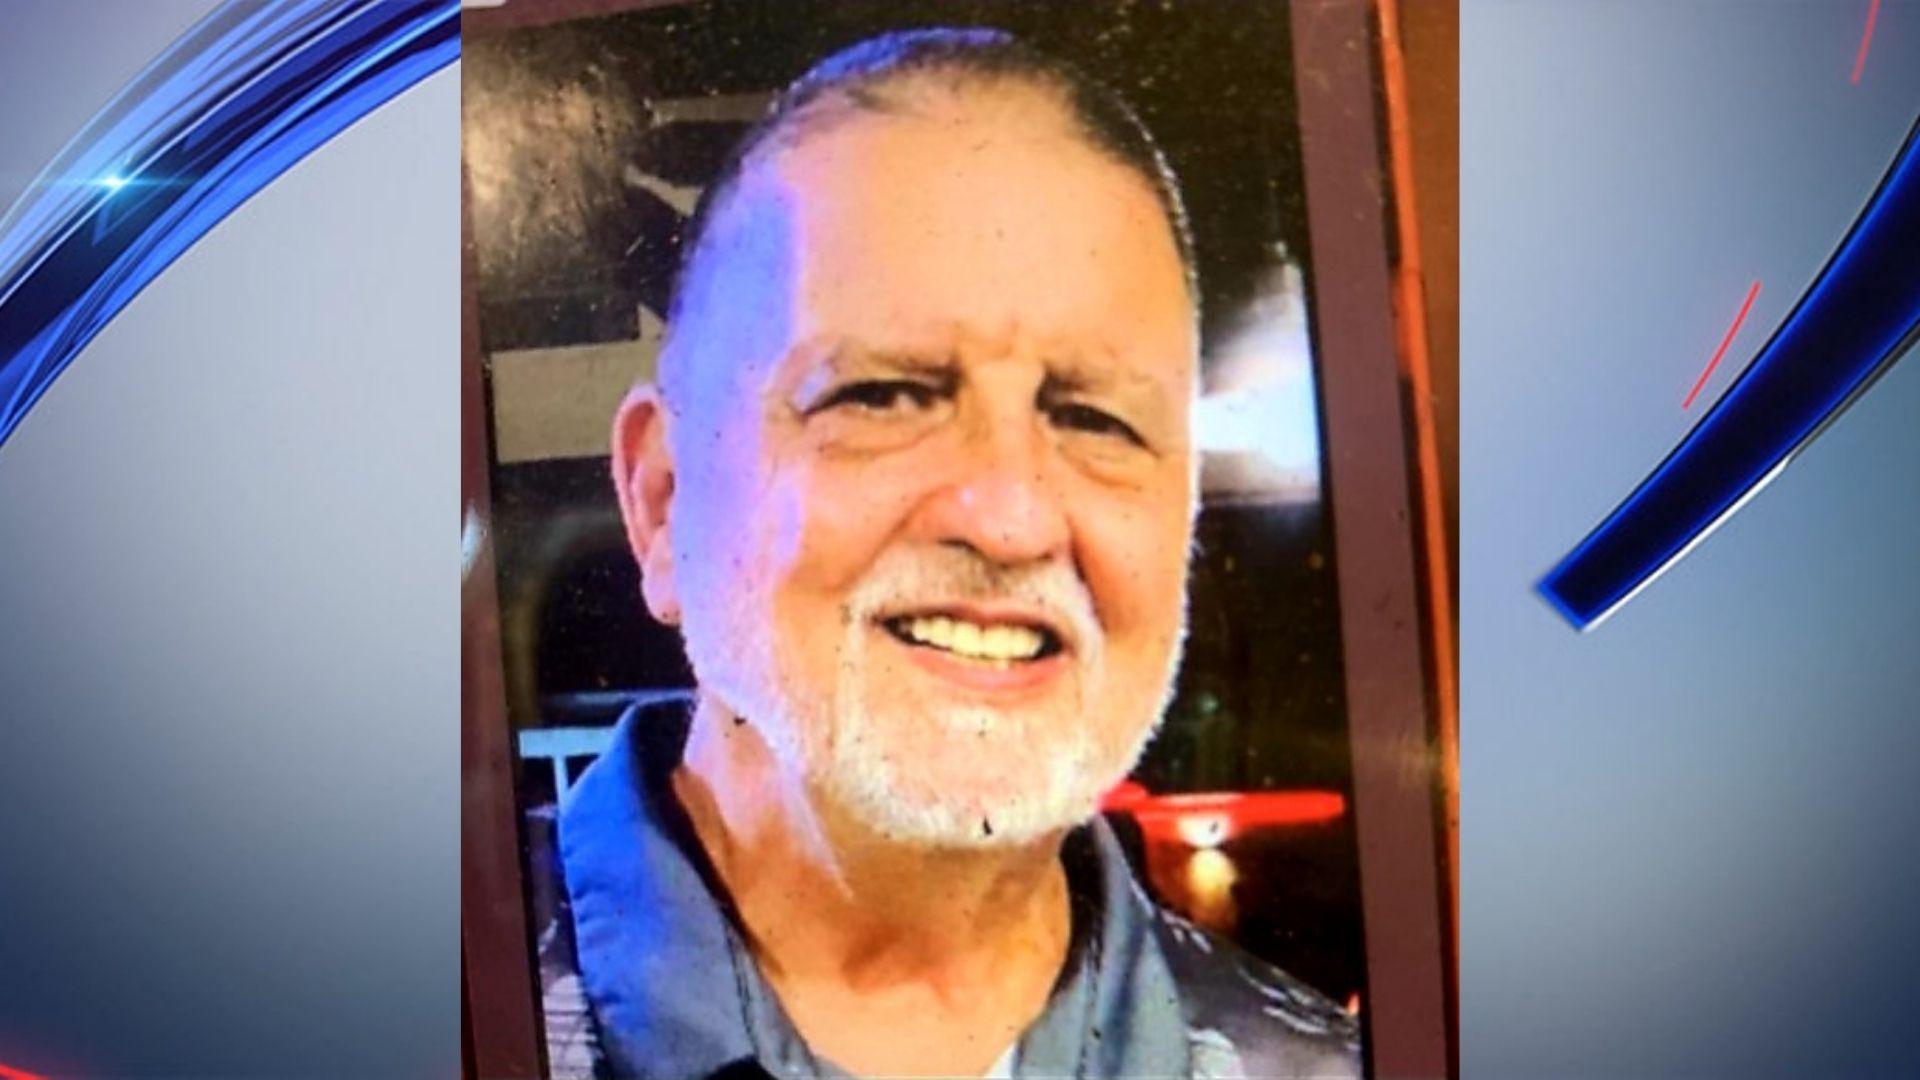 Missing NYC nurse Richard Albright